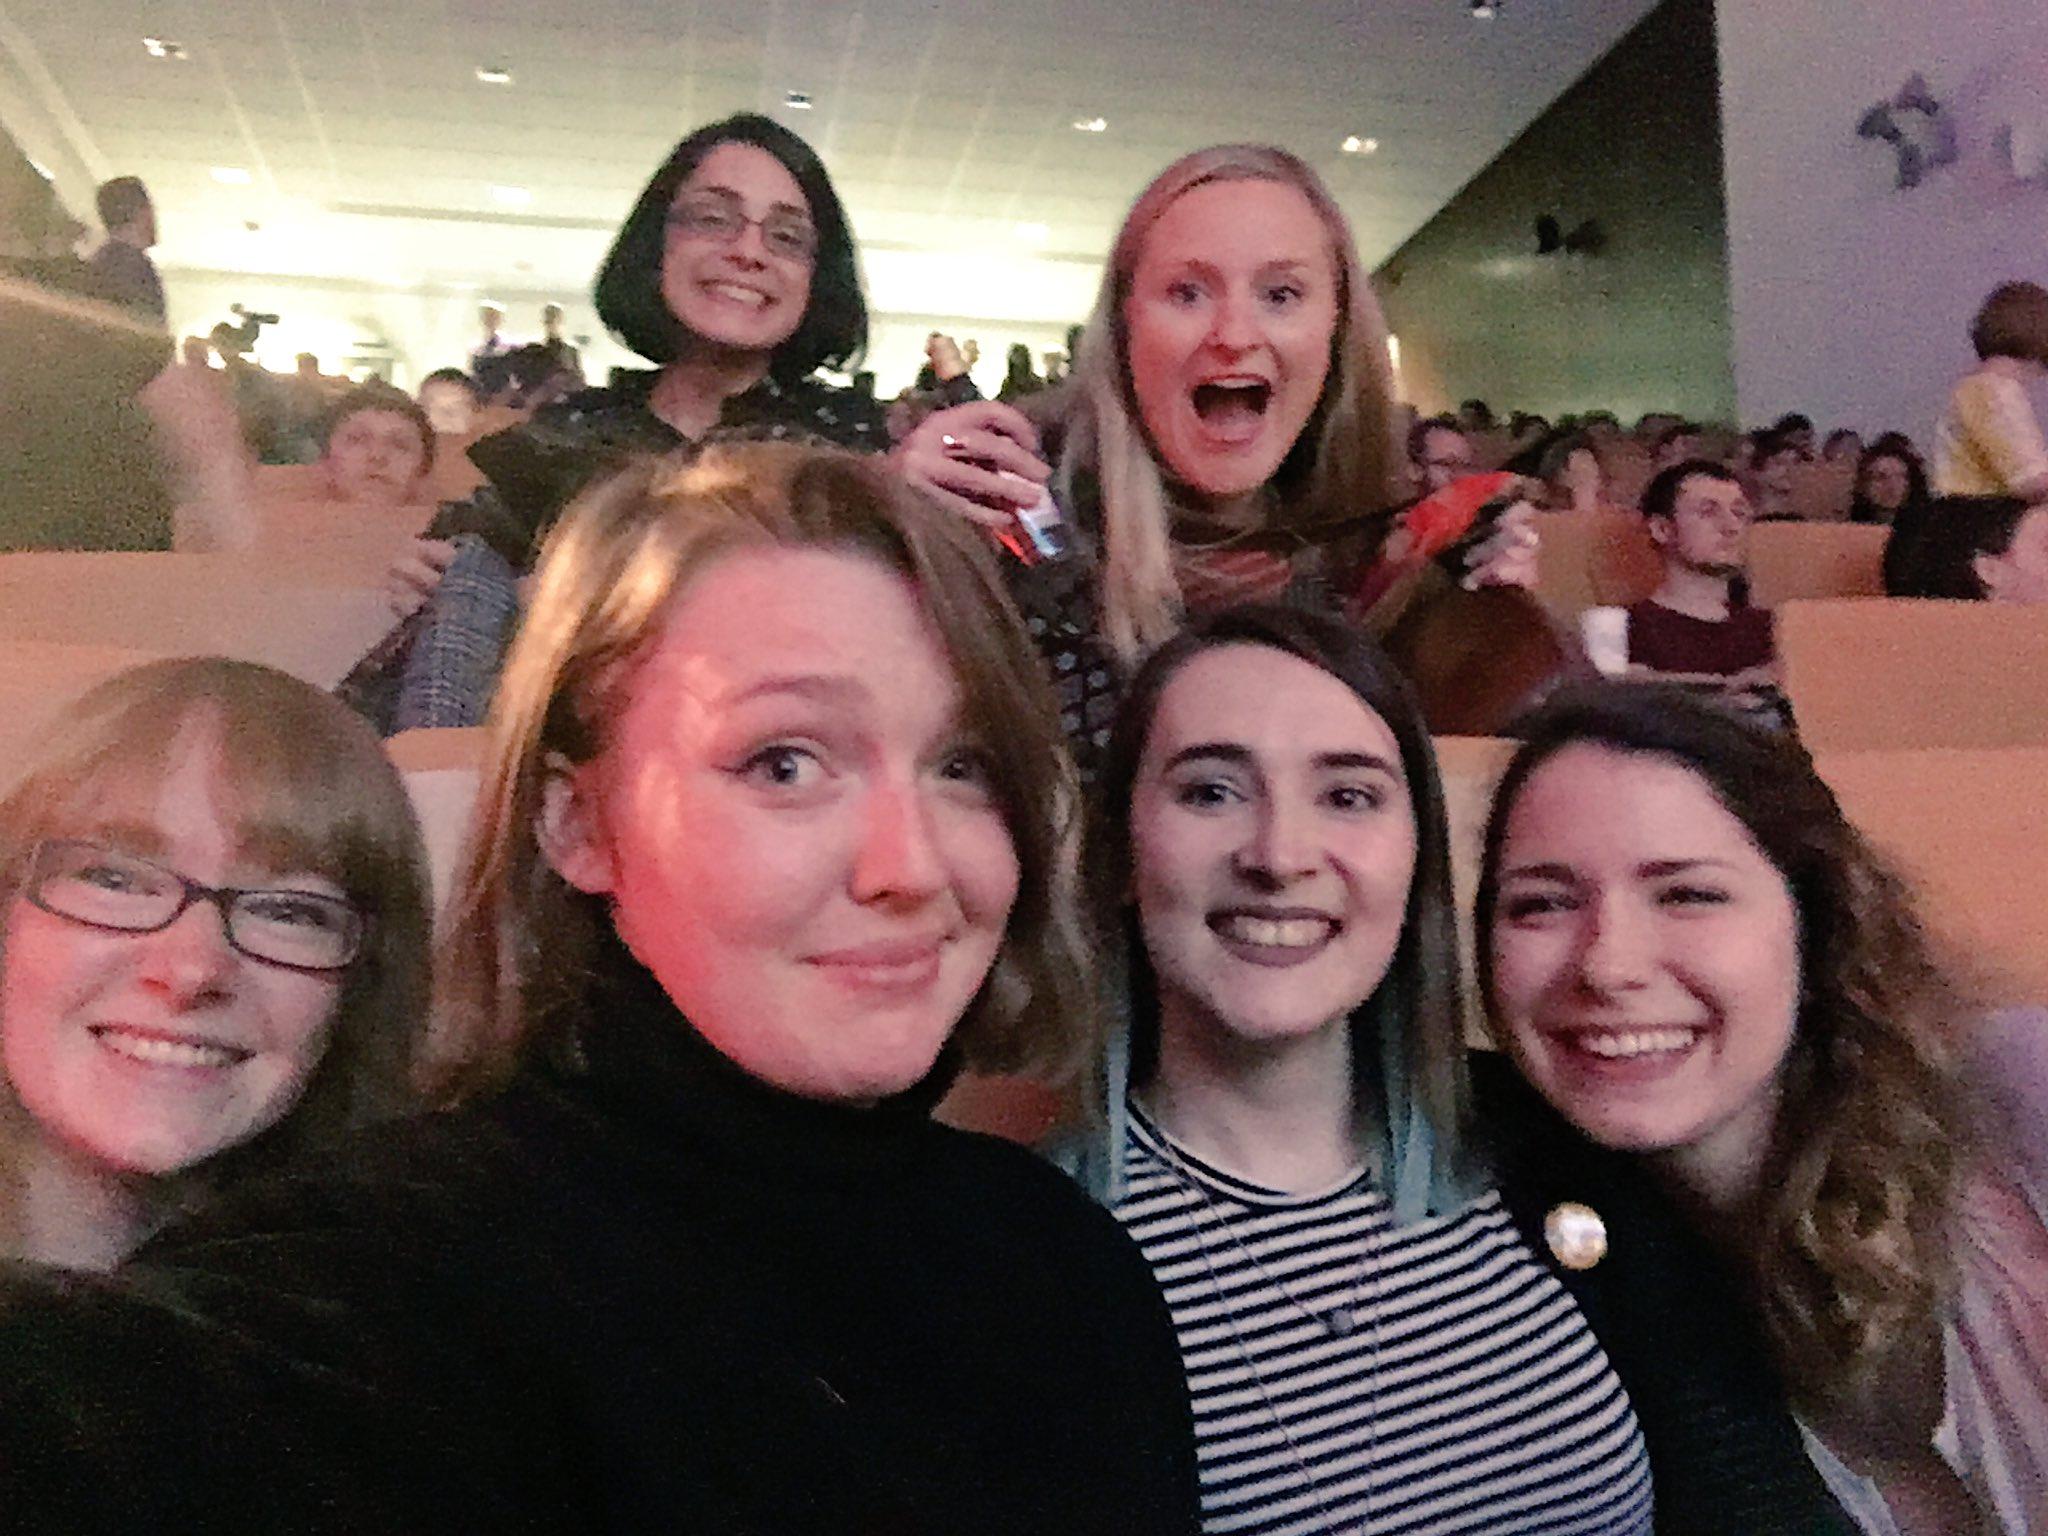 Can't wait to speak at #GamesPK with these amazing women! @JessHider @zoegsams @TimeaTabori @toadrick @ClareDundee https://t.co/3lSIANhReL